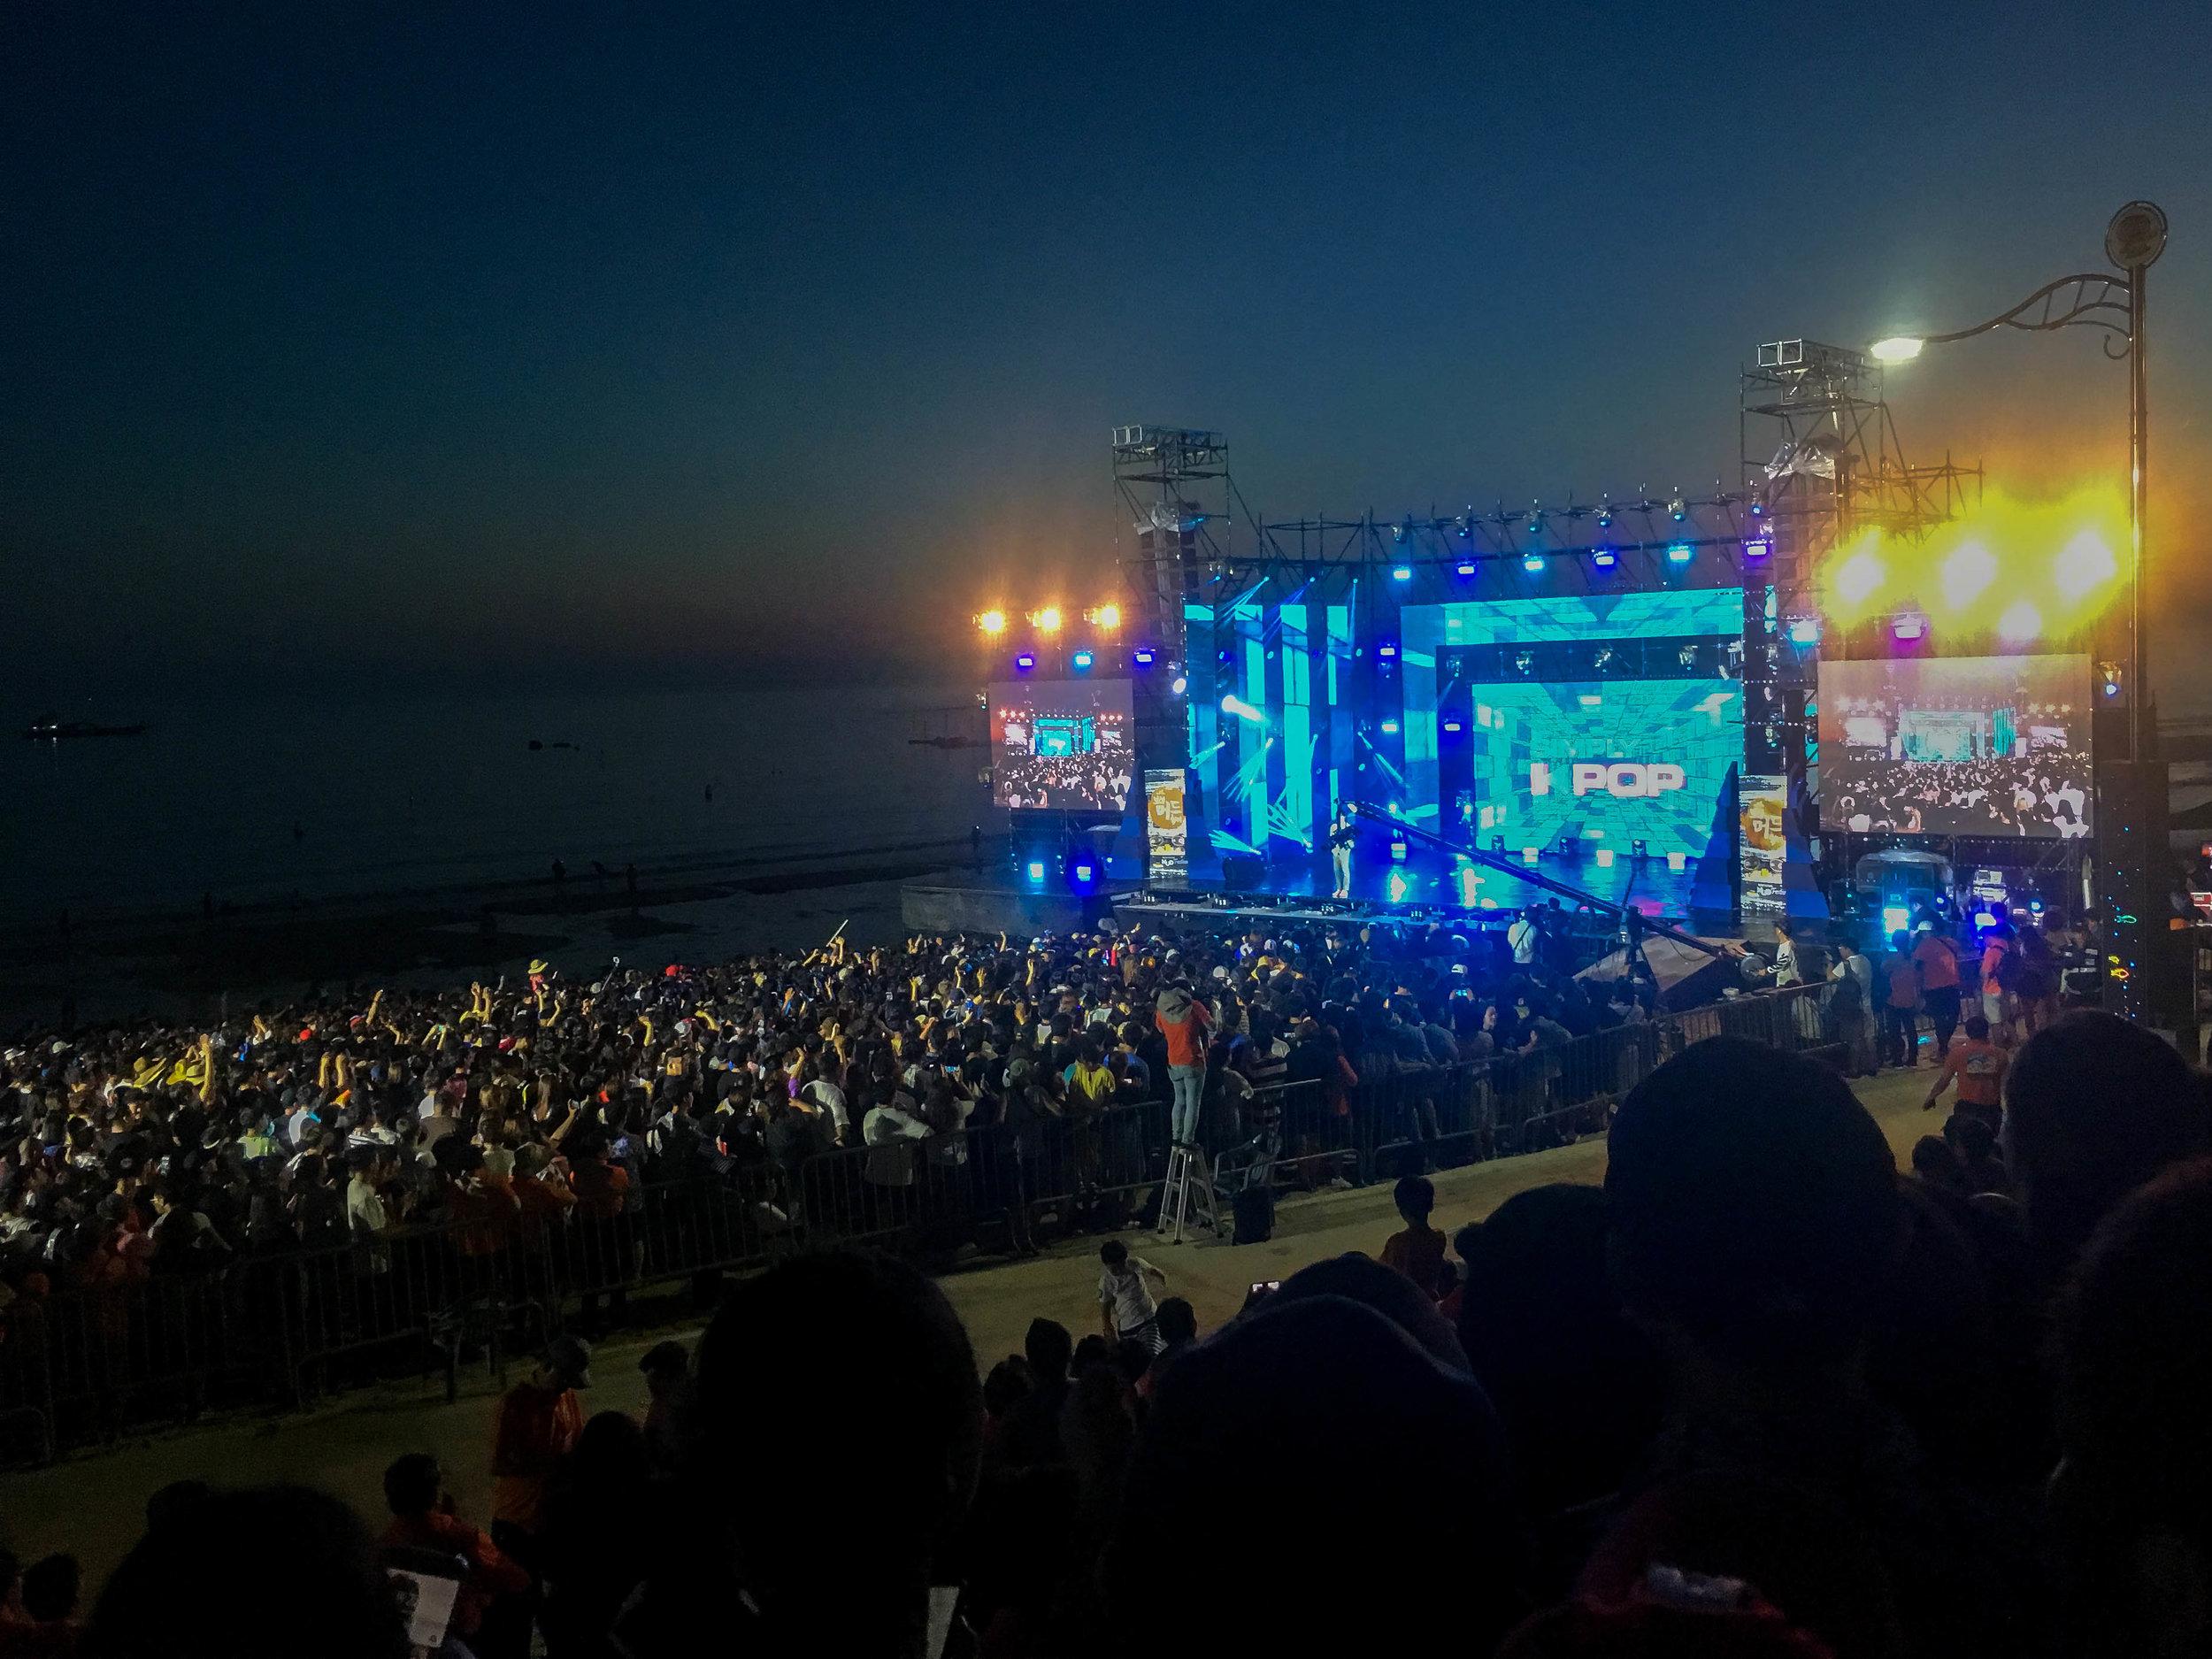 20180714-IMG_9366_boryeong-mud.jpg